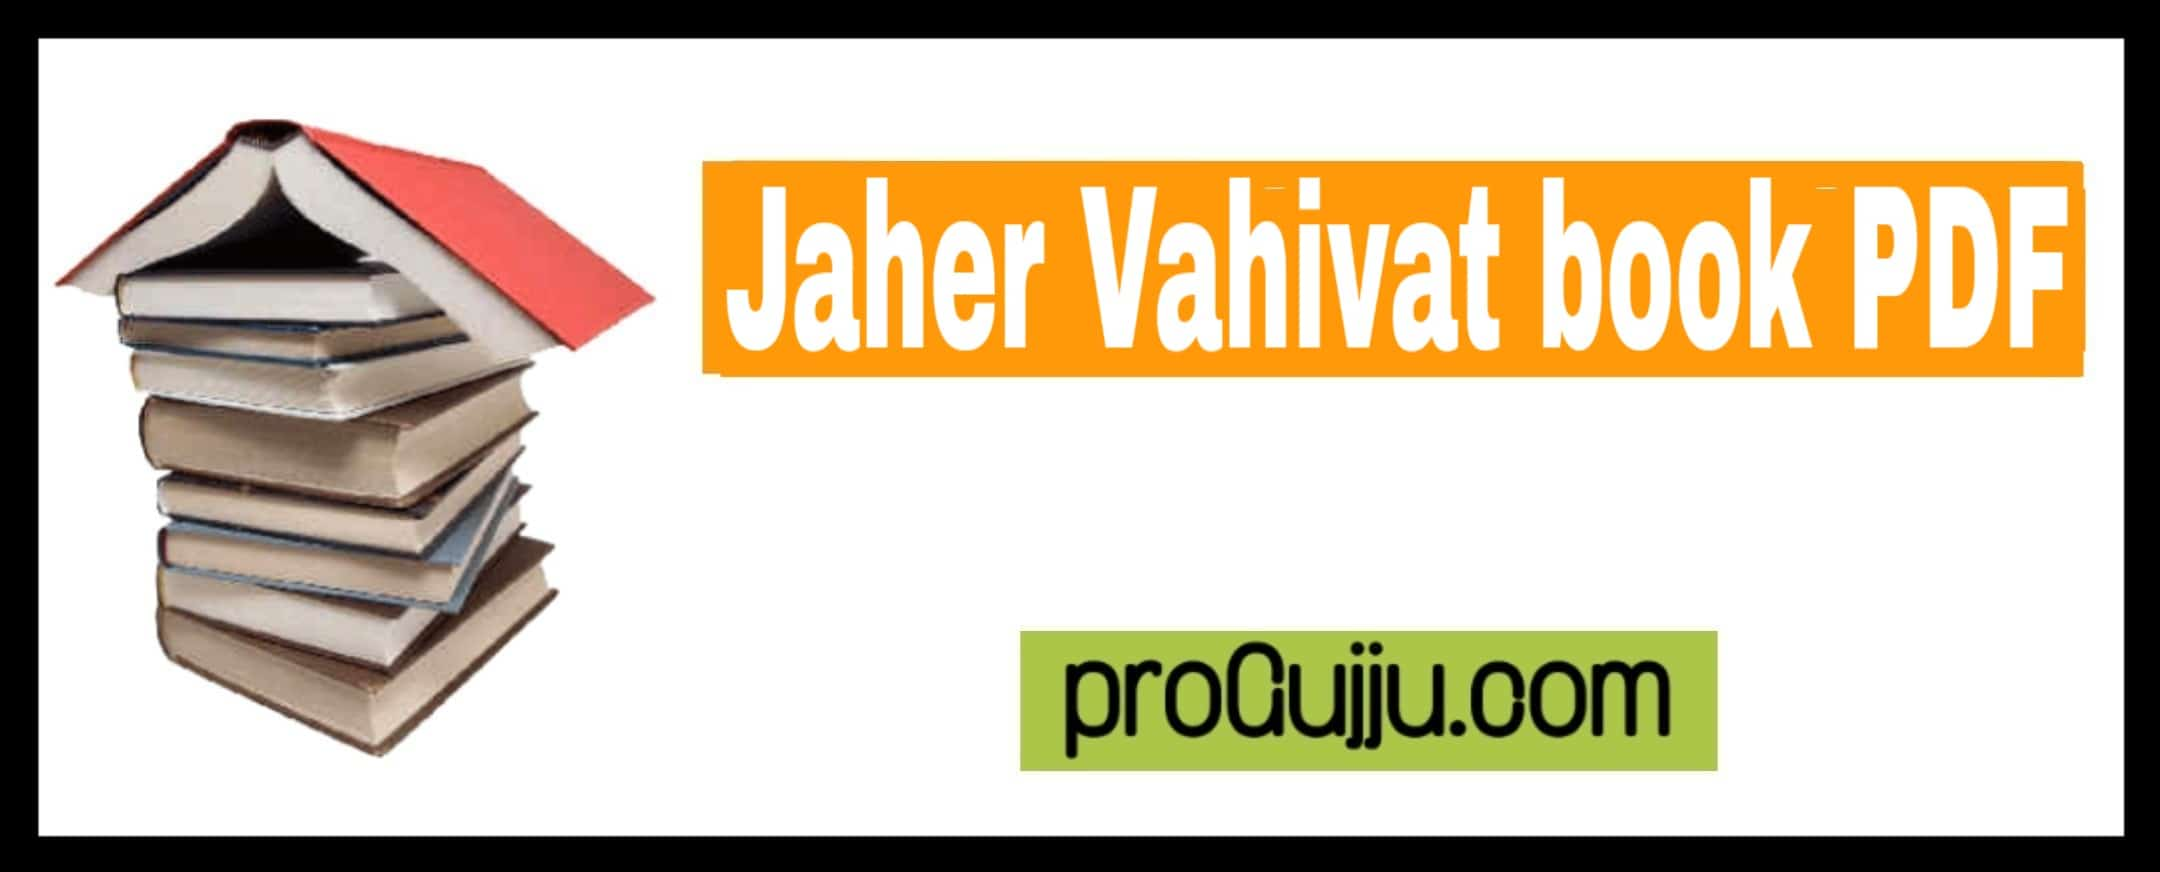 Jaher Vahivat Book PDF